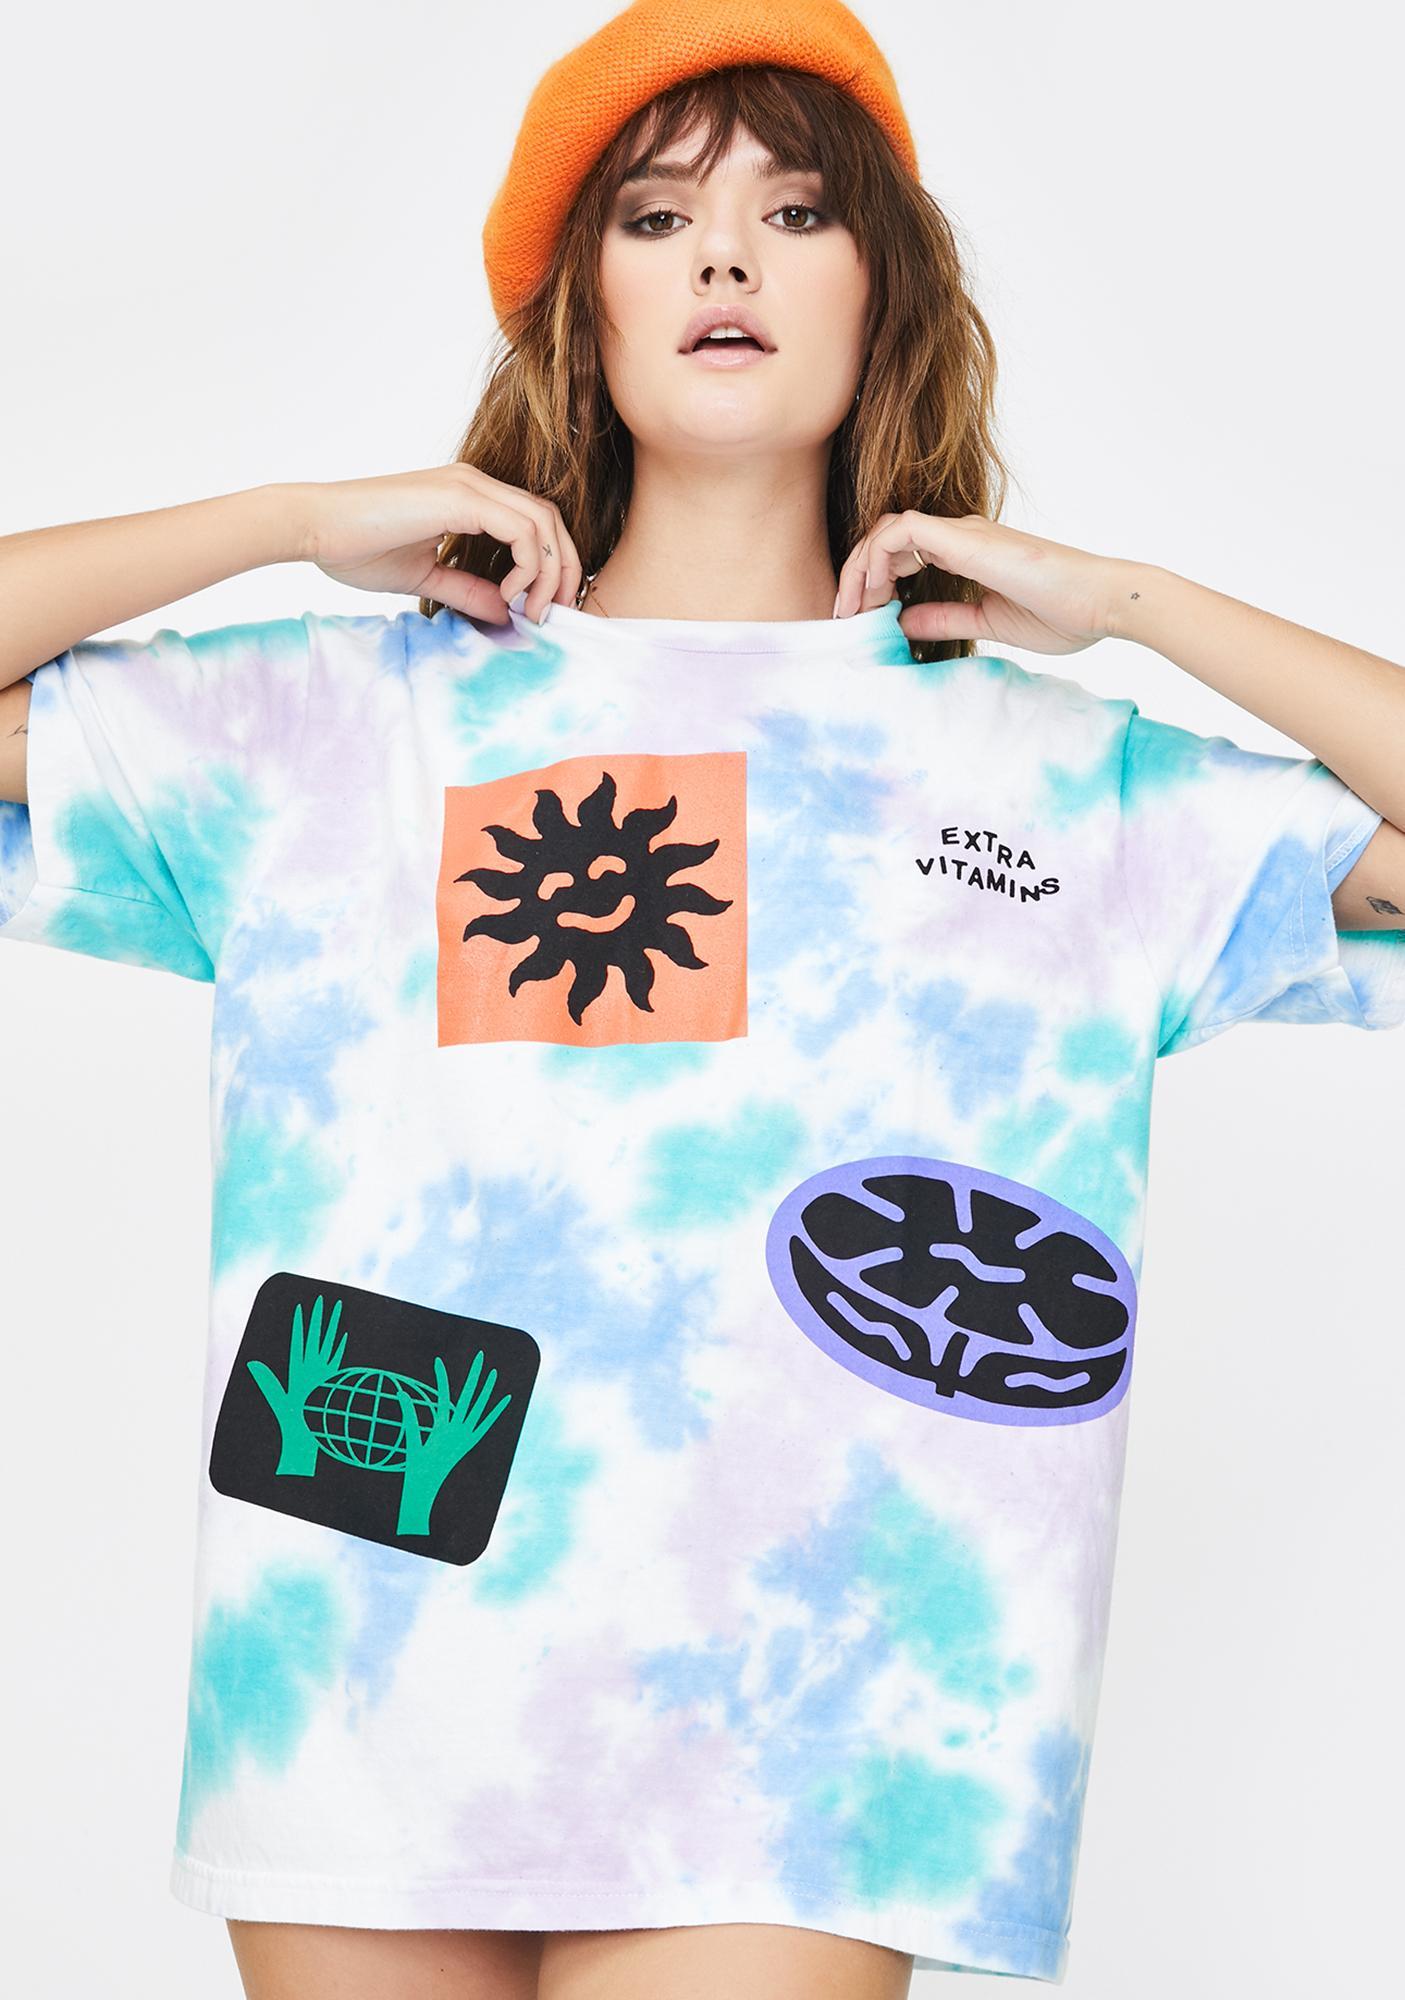 Extra Vitamins Sticker Dye T-Shirt